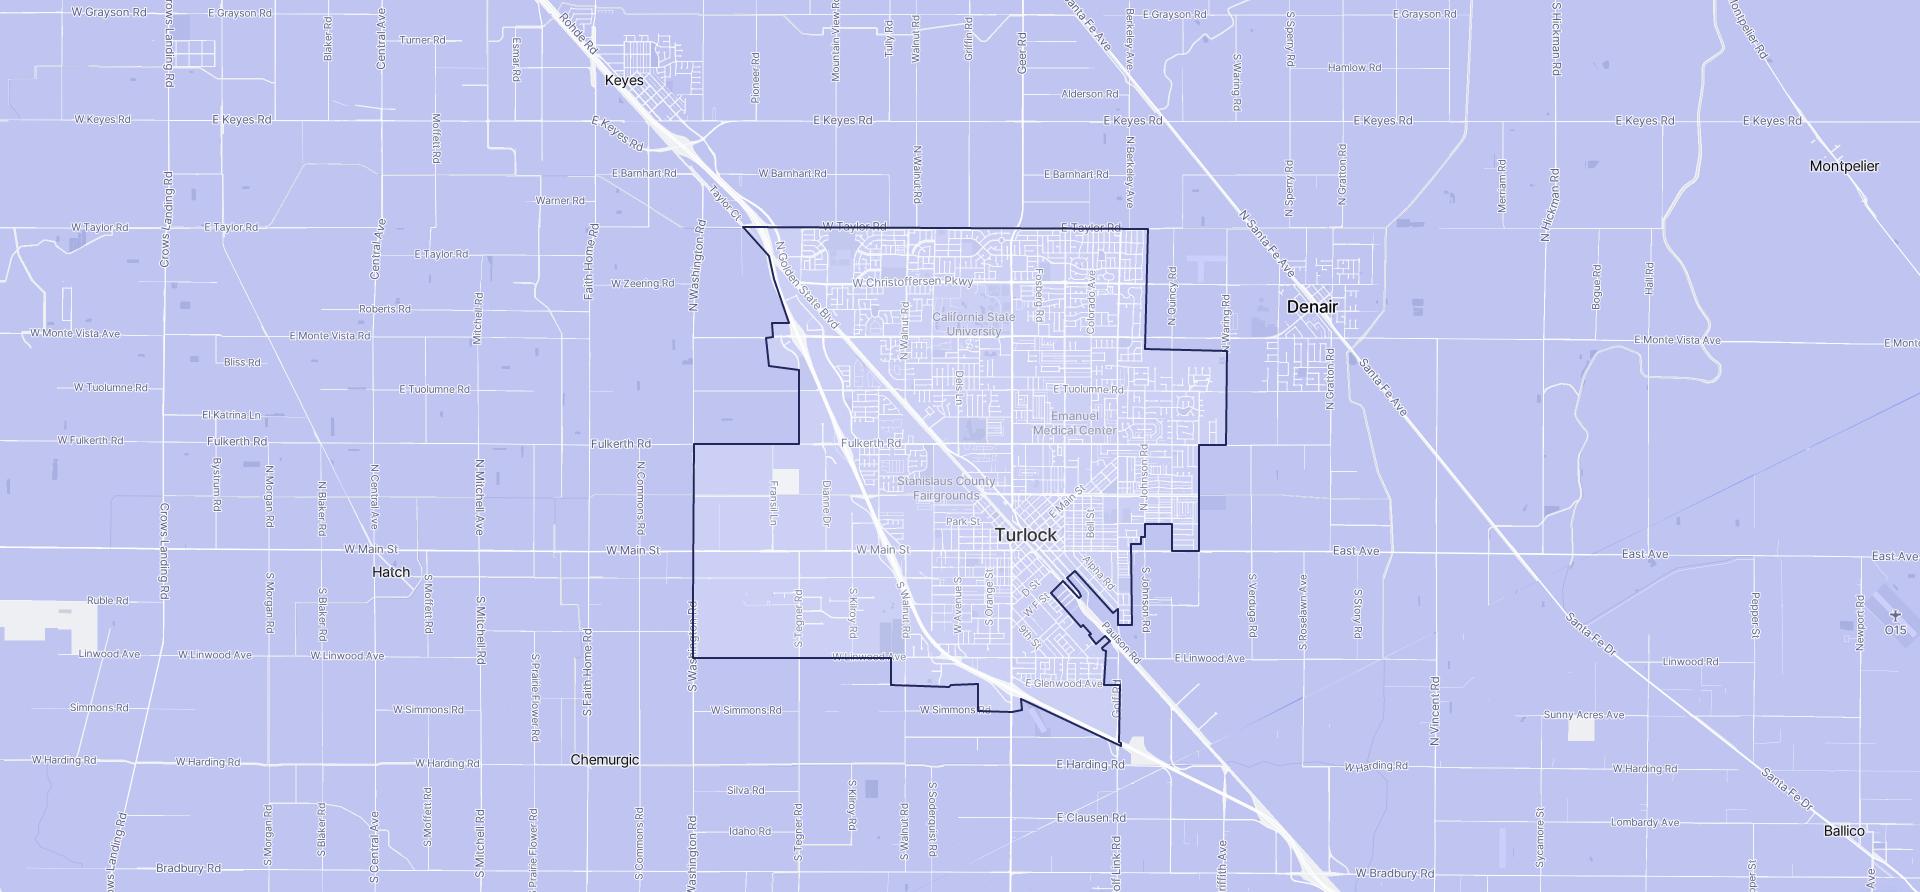 Image of Turlock boundaries on a map.